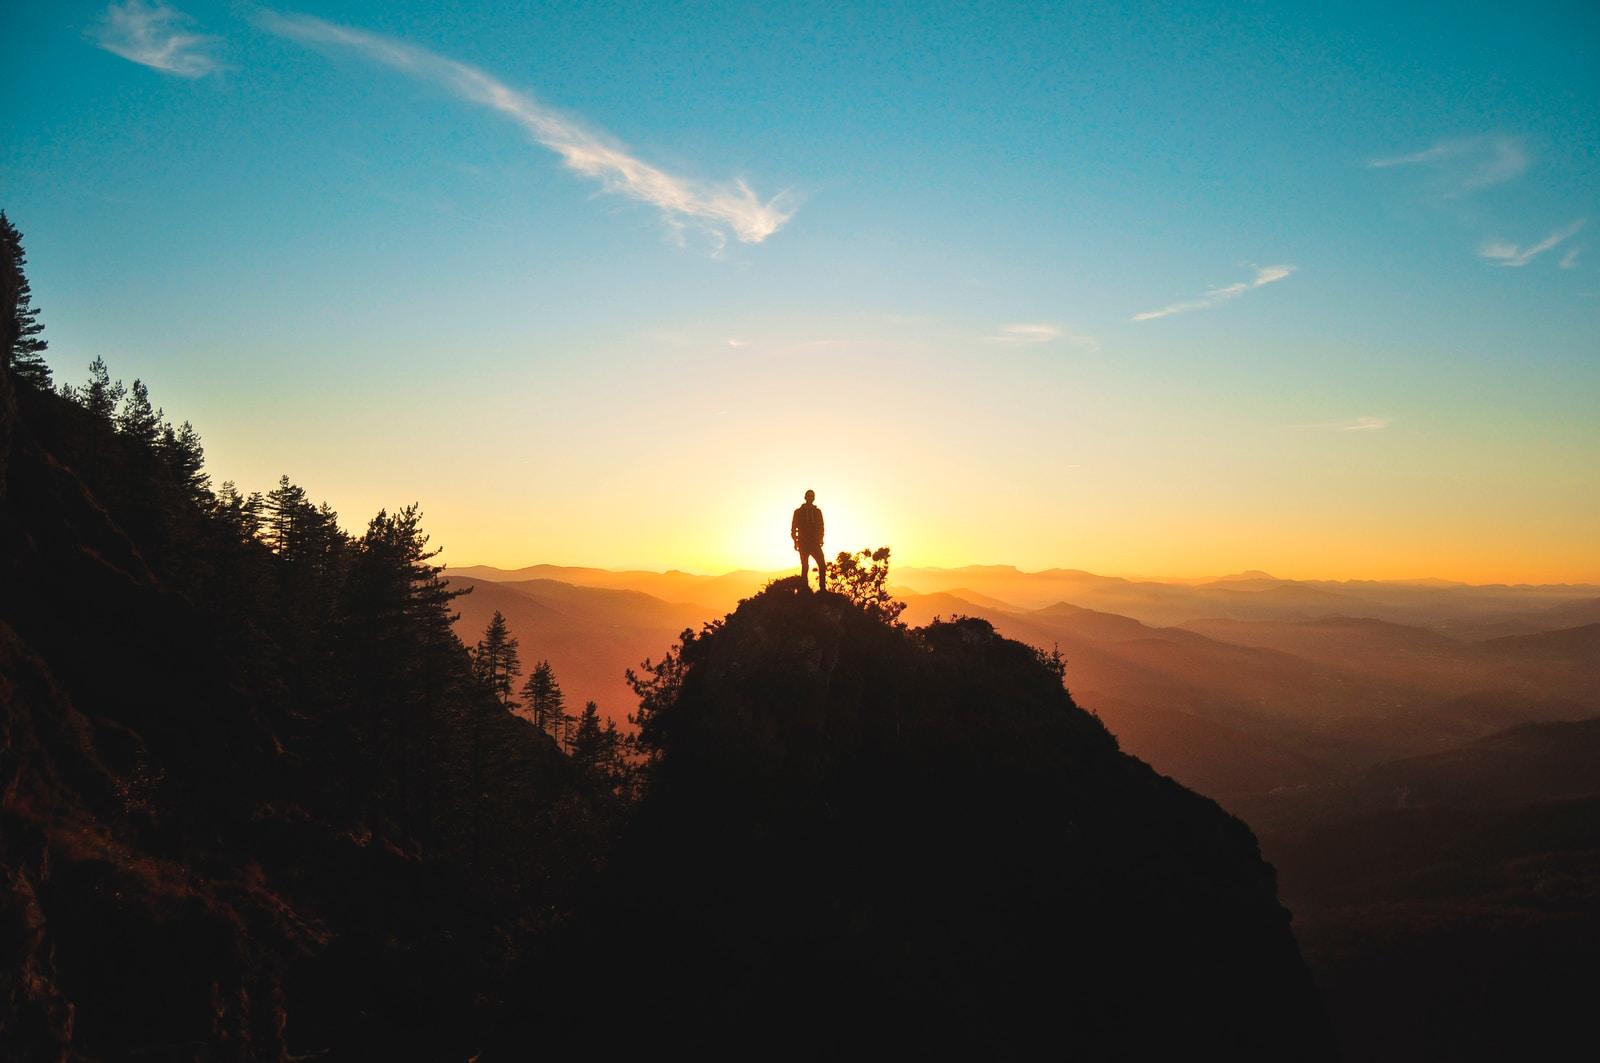 silhouette of man standing on mountain peak